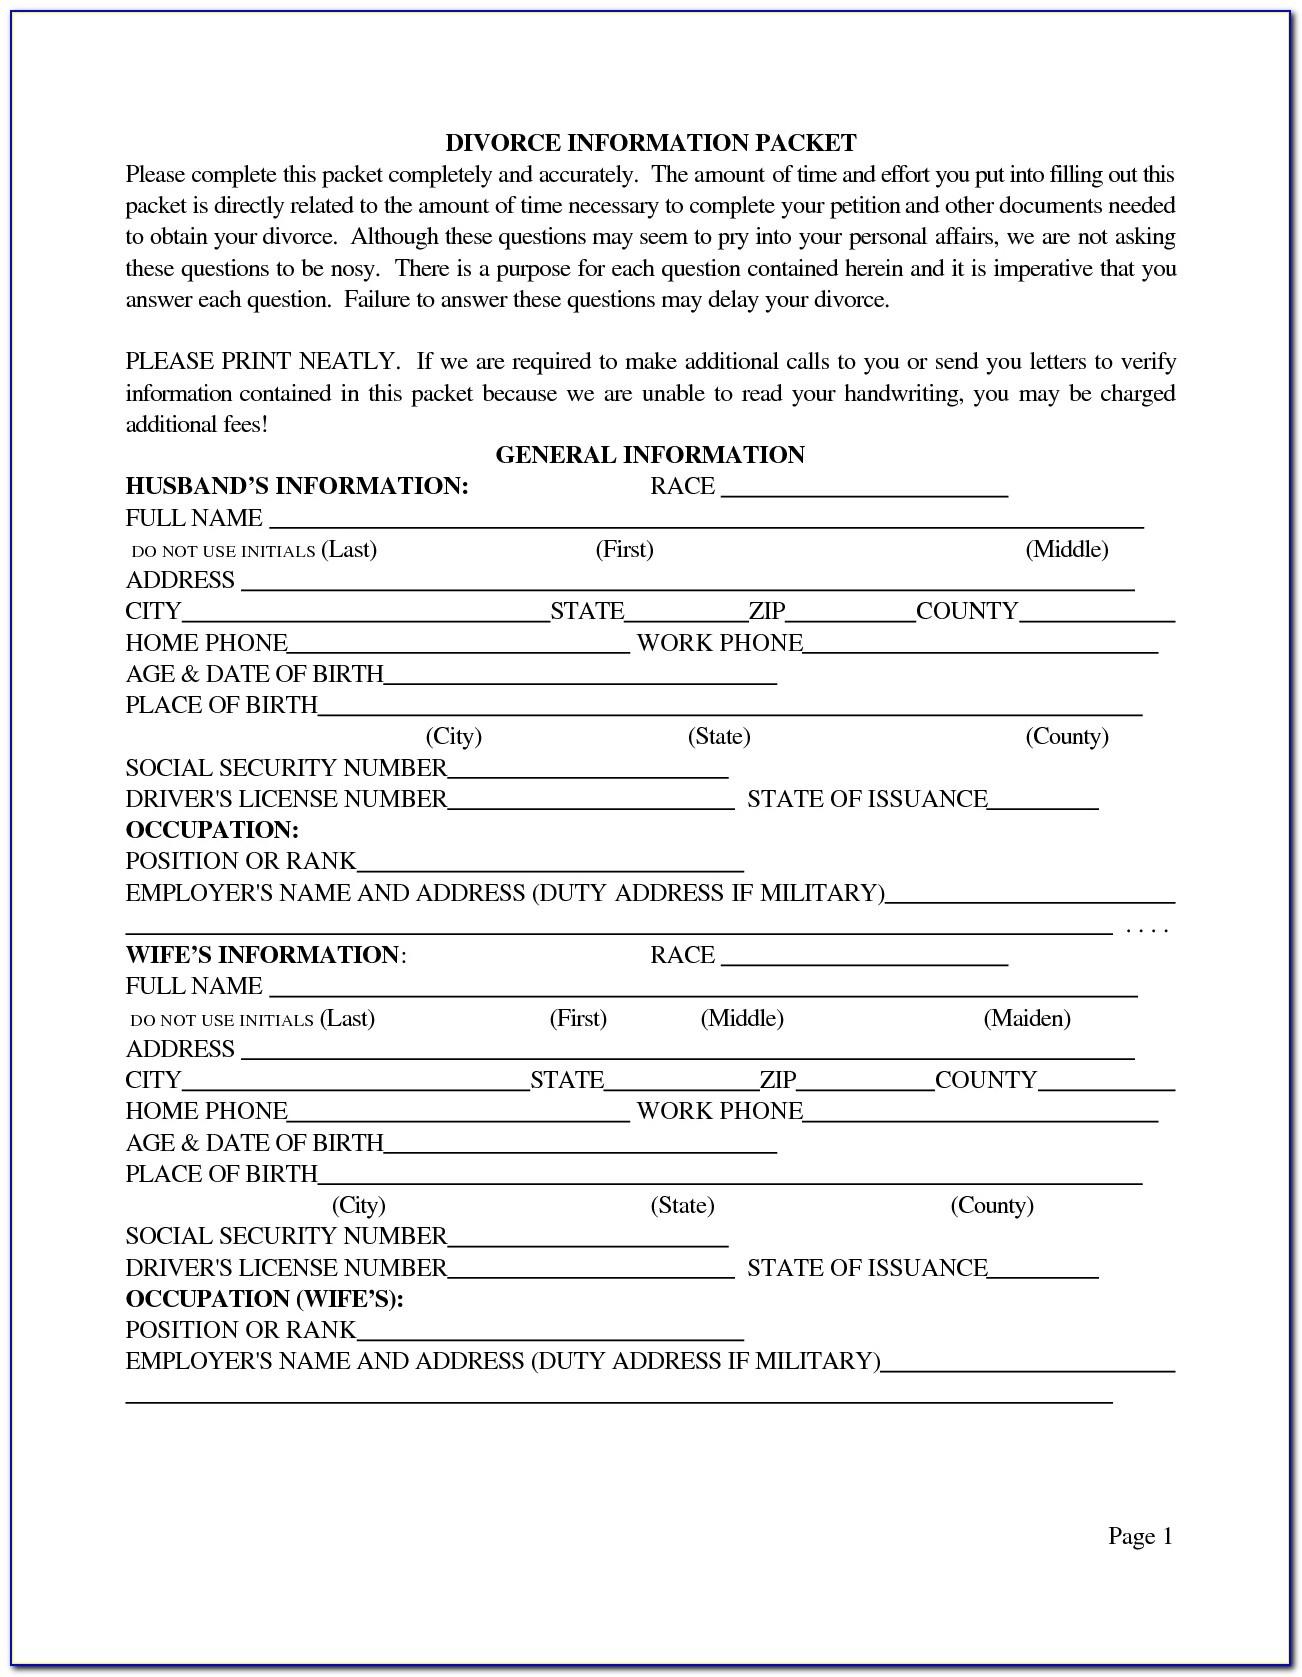 Free Printable Divorce Decree Forms - Form : Resume Examples #m9Pvv09Pob - Free Printable Divorce Decree Forms